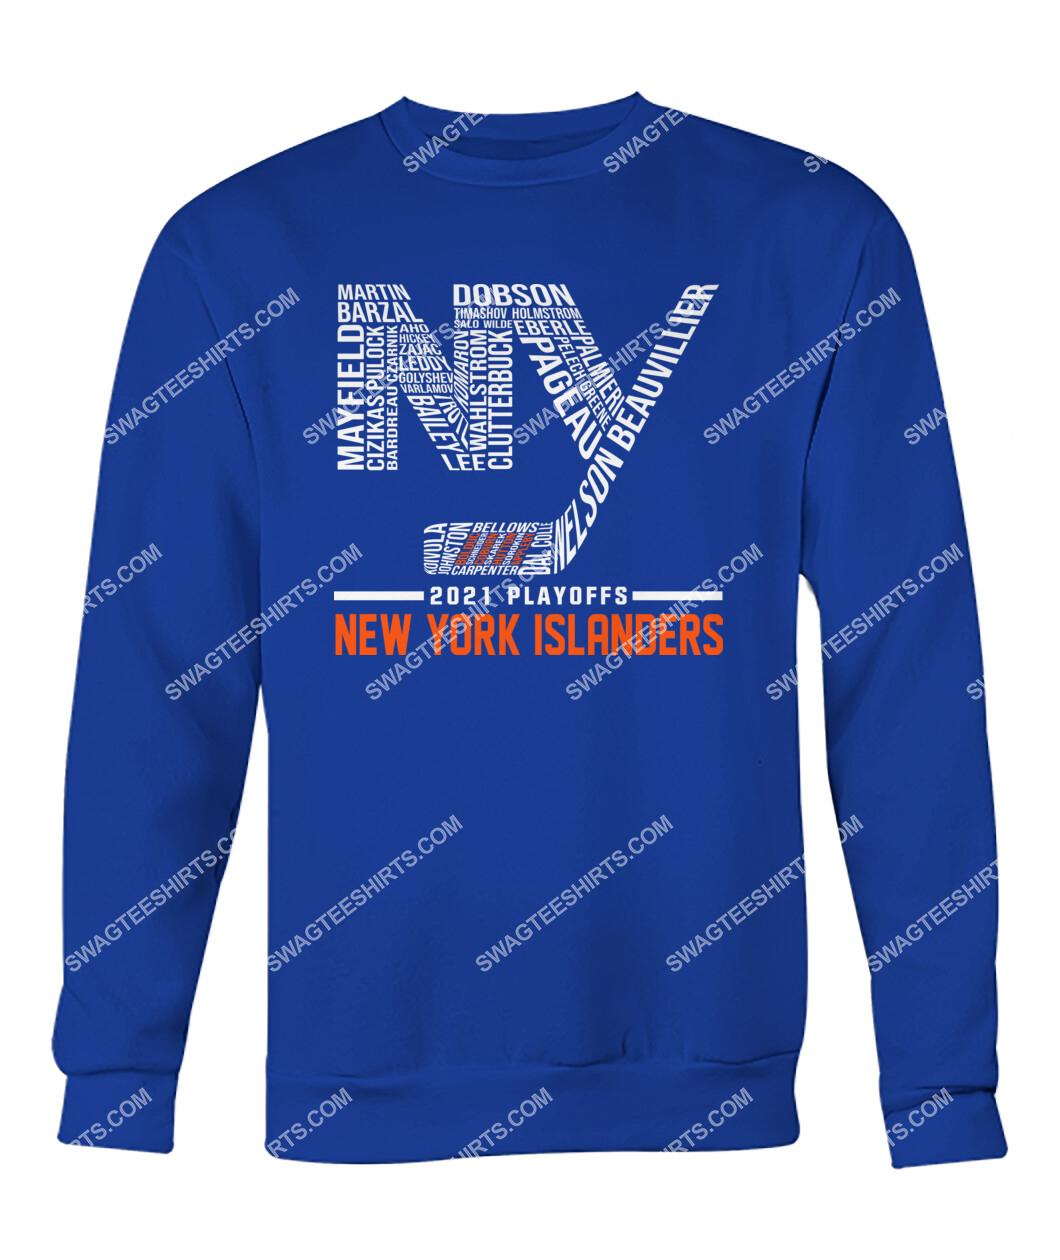 2021 playoffs new york islanders national hockey league sweatshirt 1